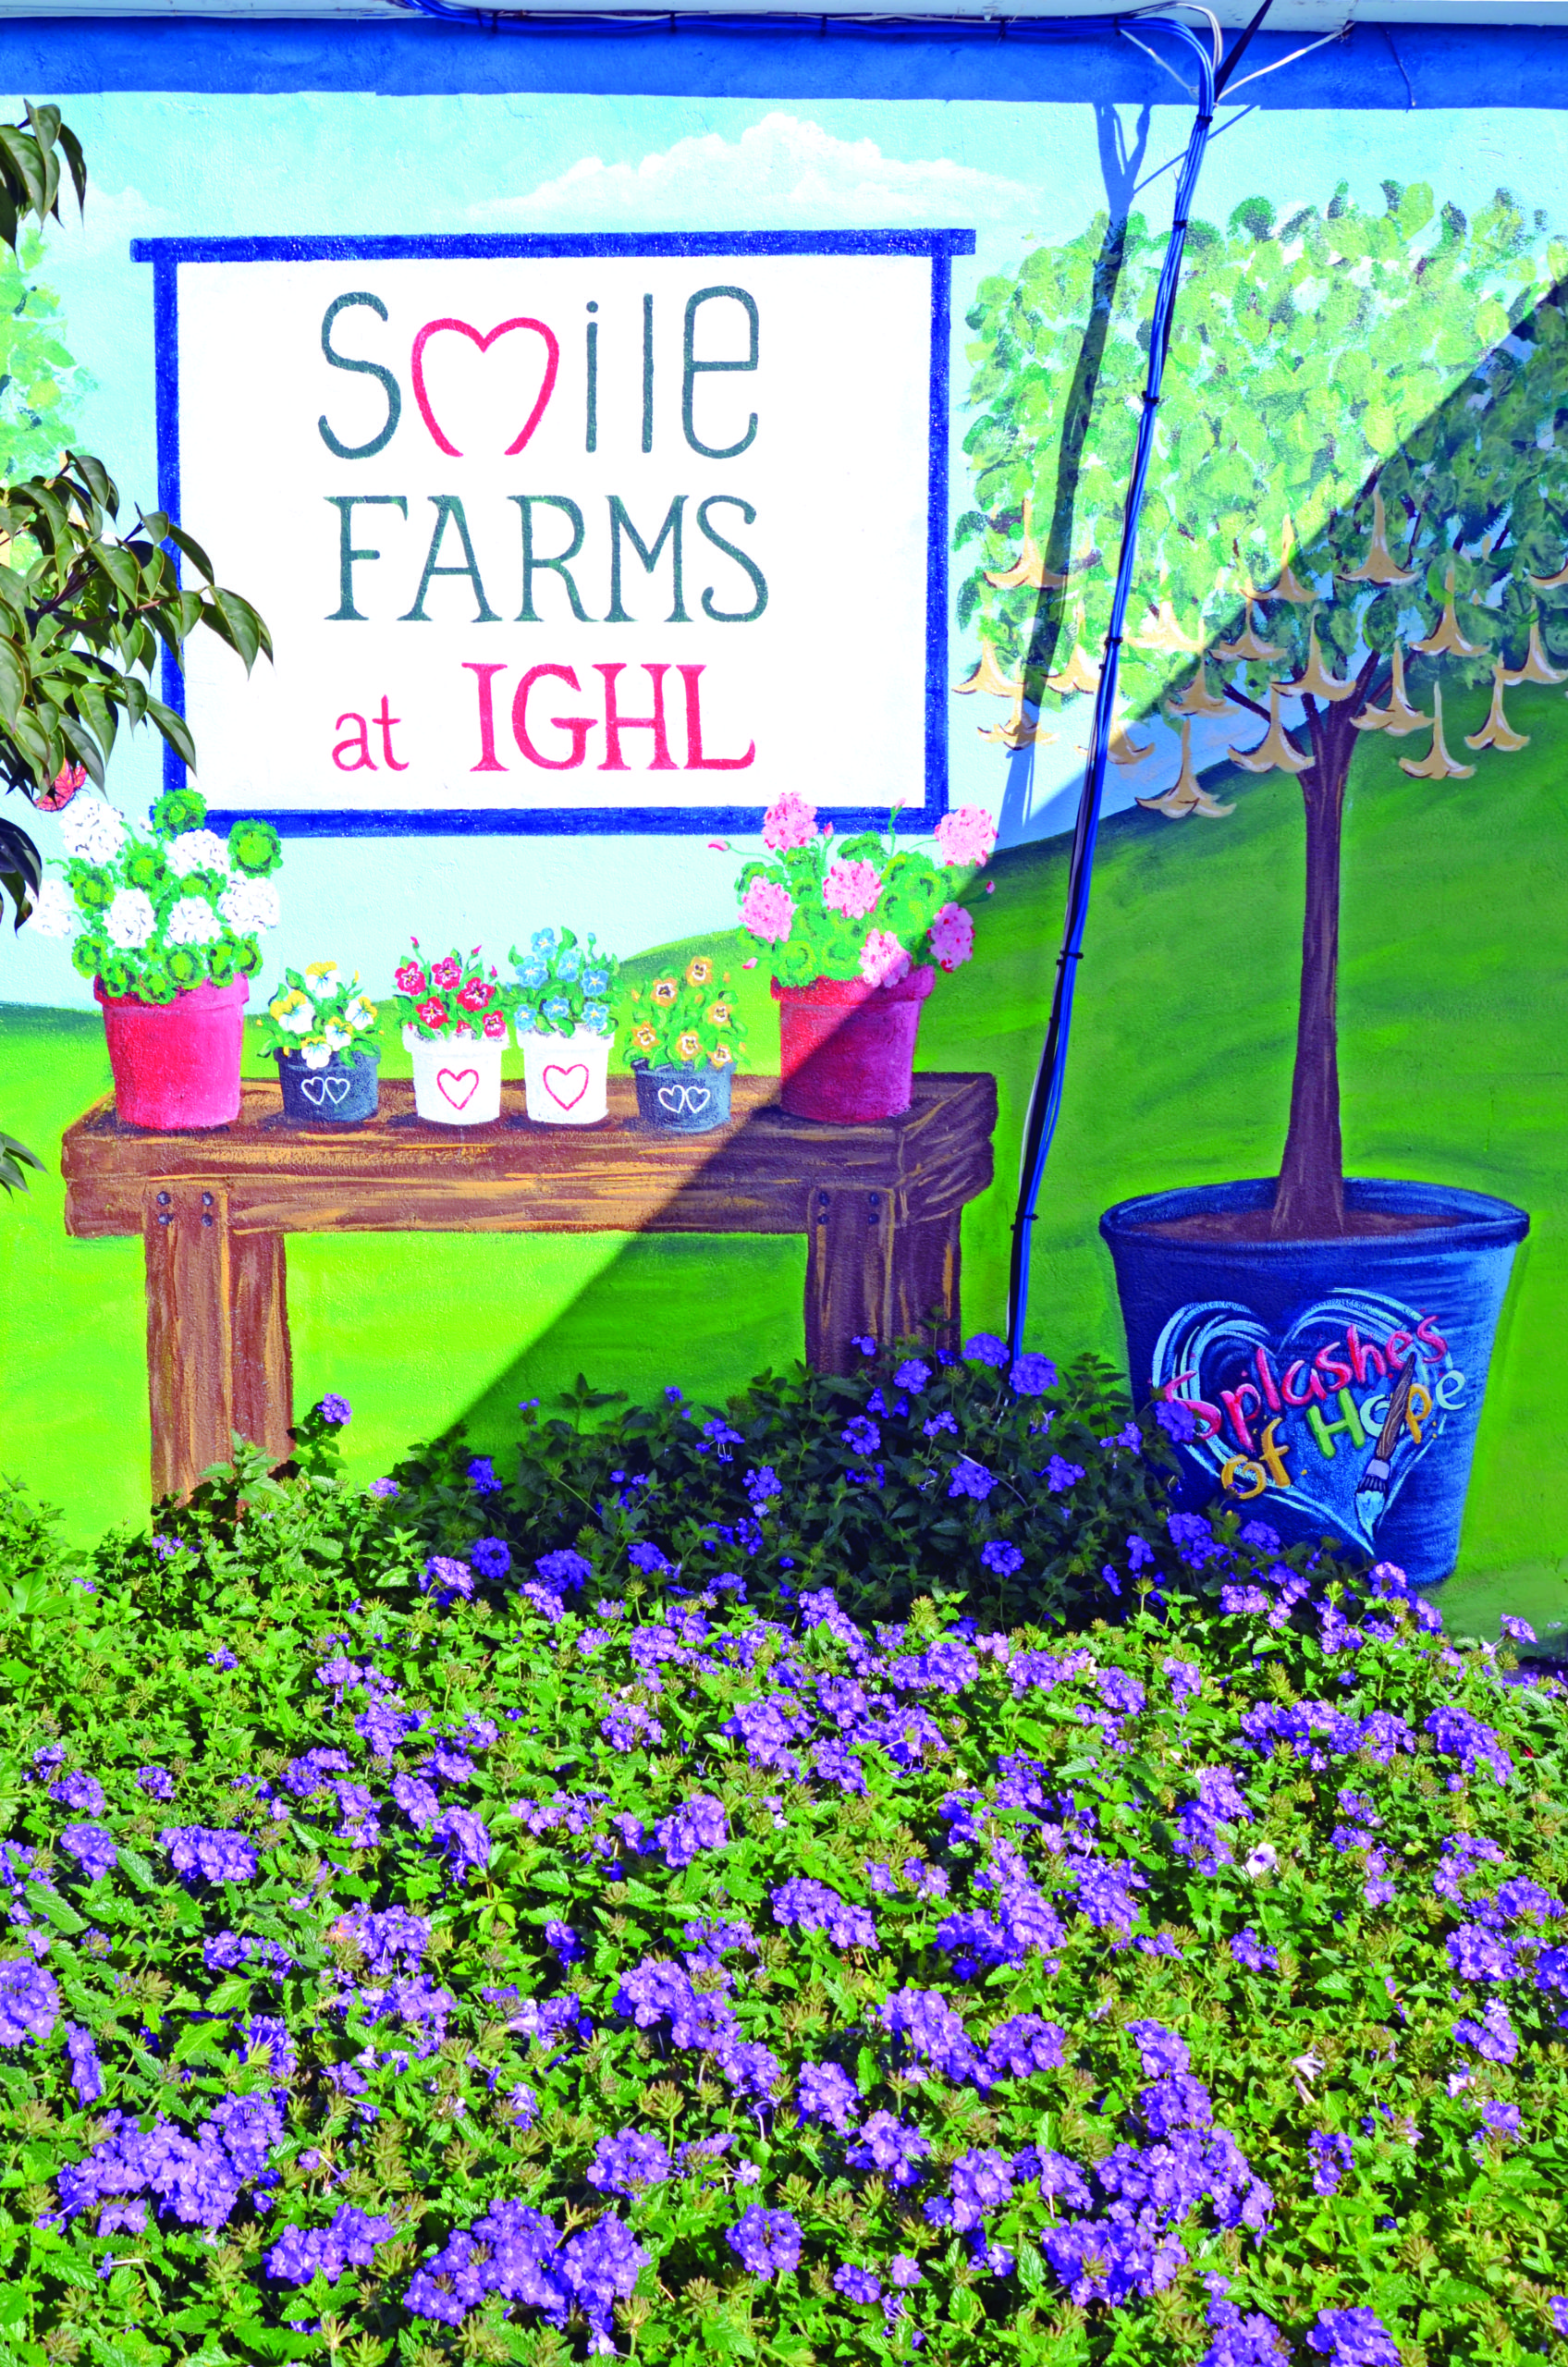 Smile Farms at IGHL. KIM COVELL